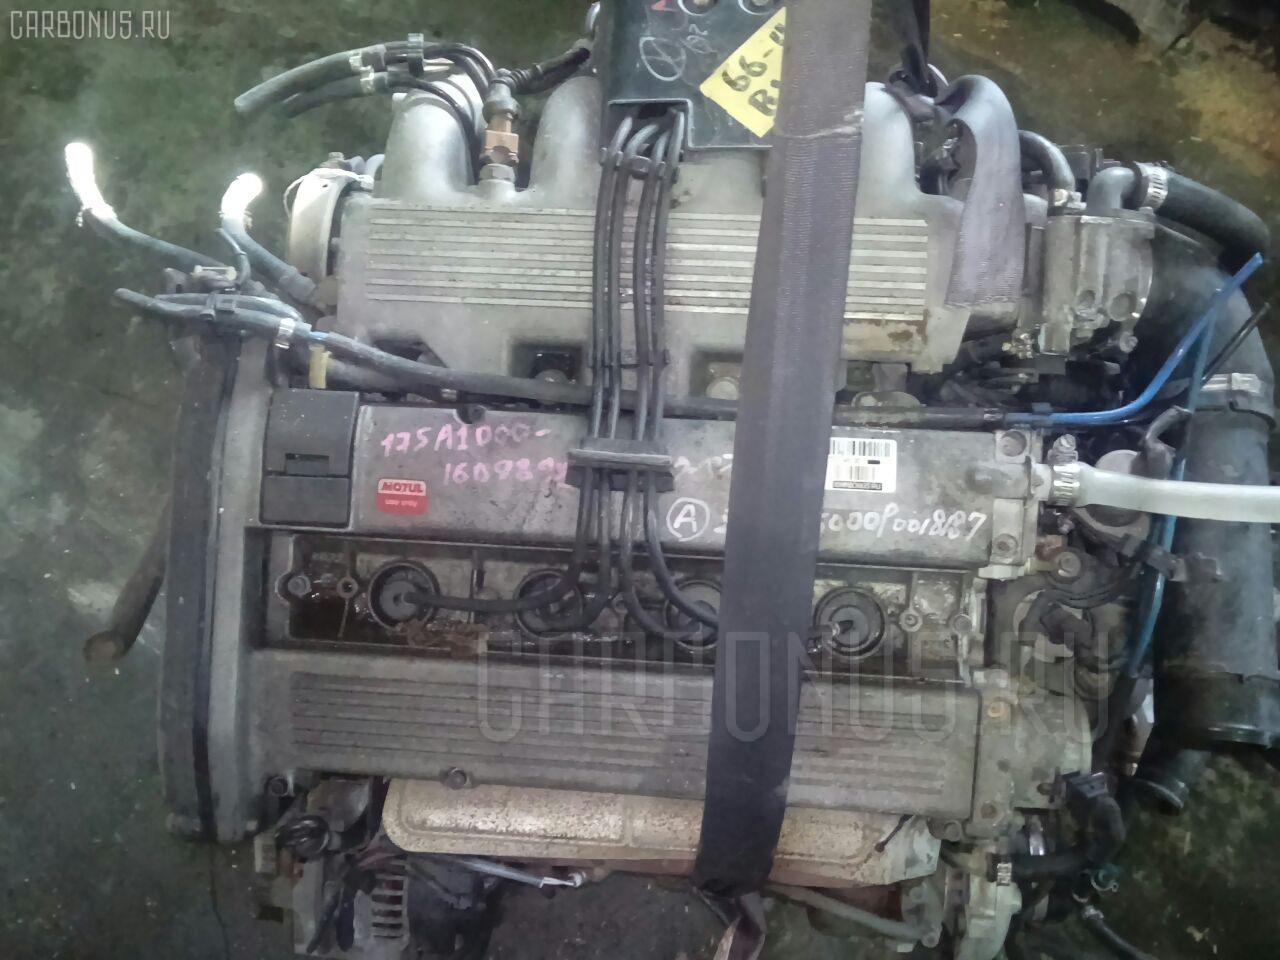 Двигатель FIAT COUPE 175 175A1000 Фото 9